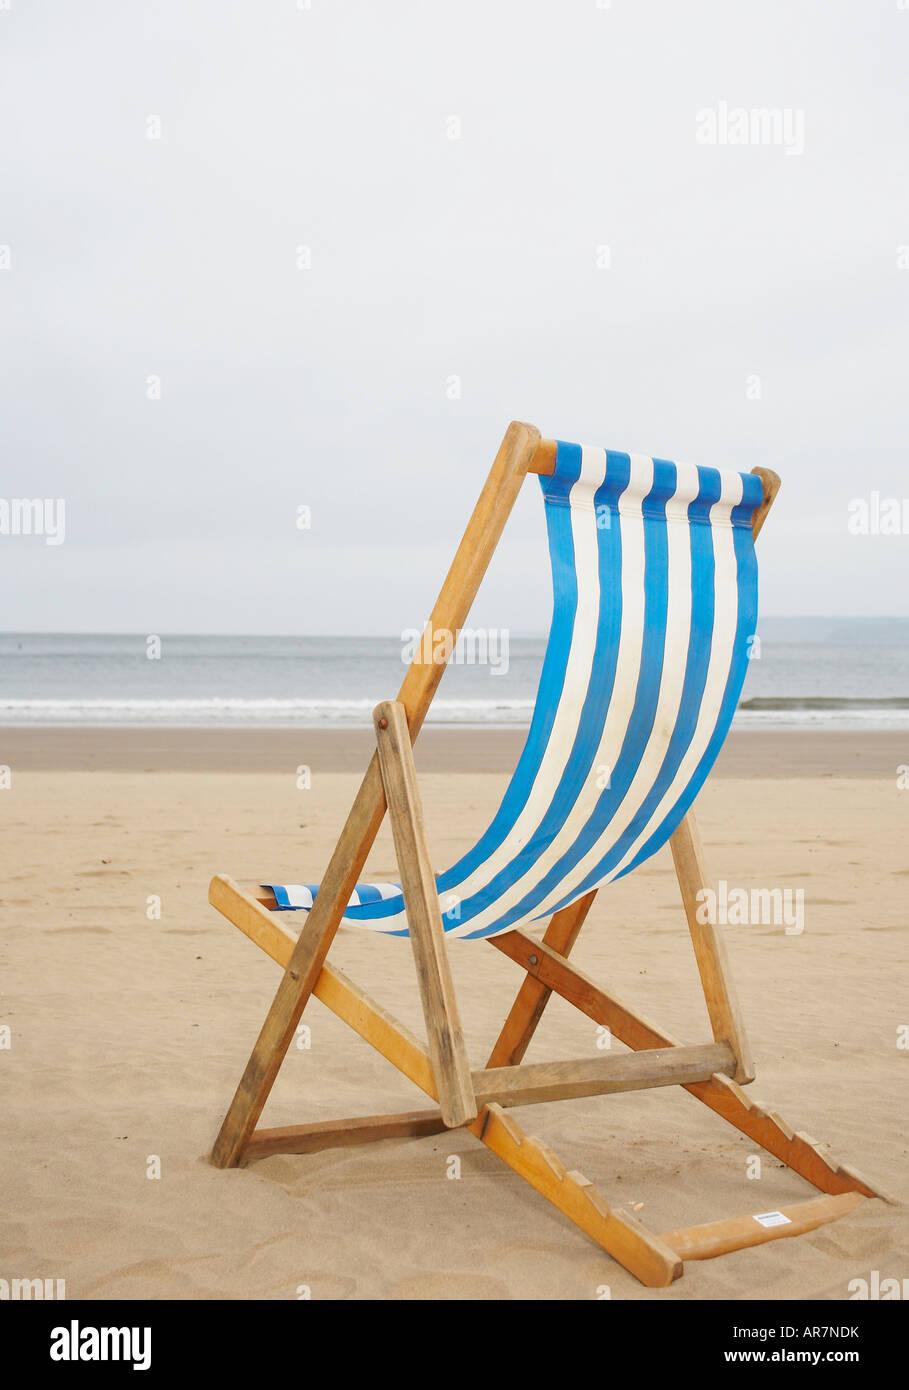 Beach Whitby Deckchair Stockfotos & Beach Whitby Deckchair Bilder ...